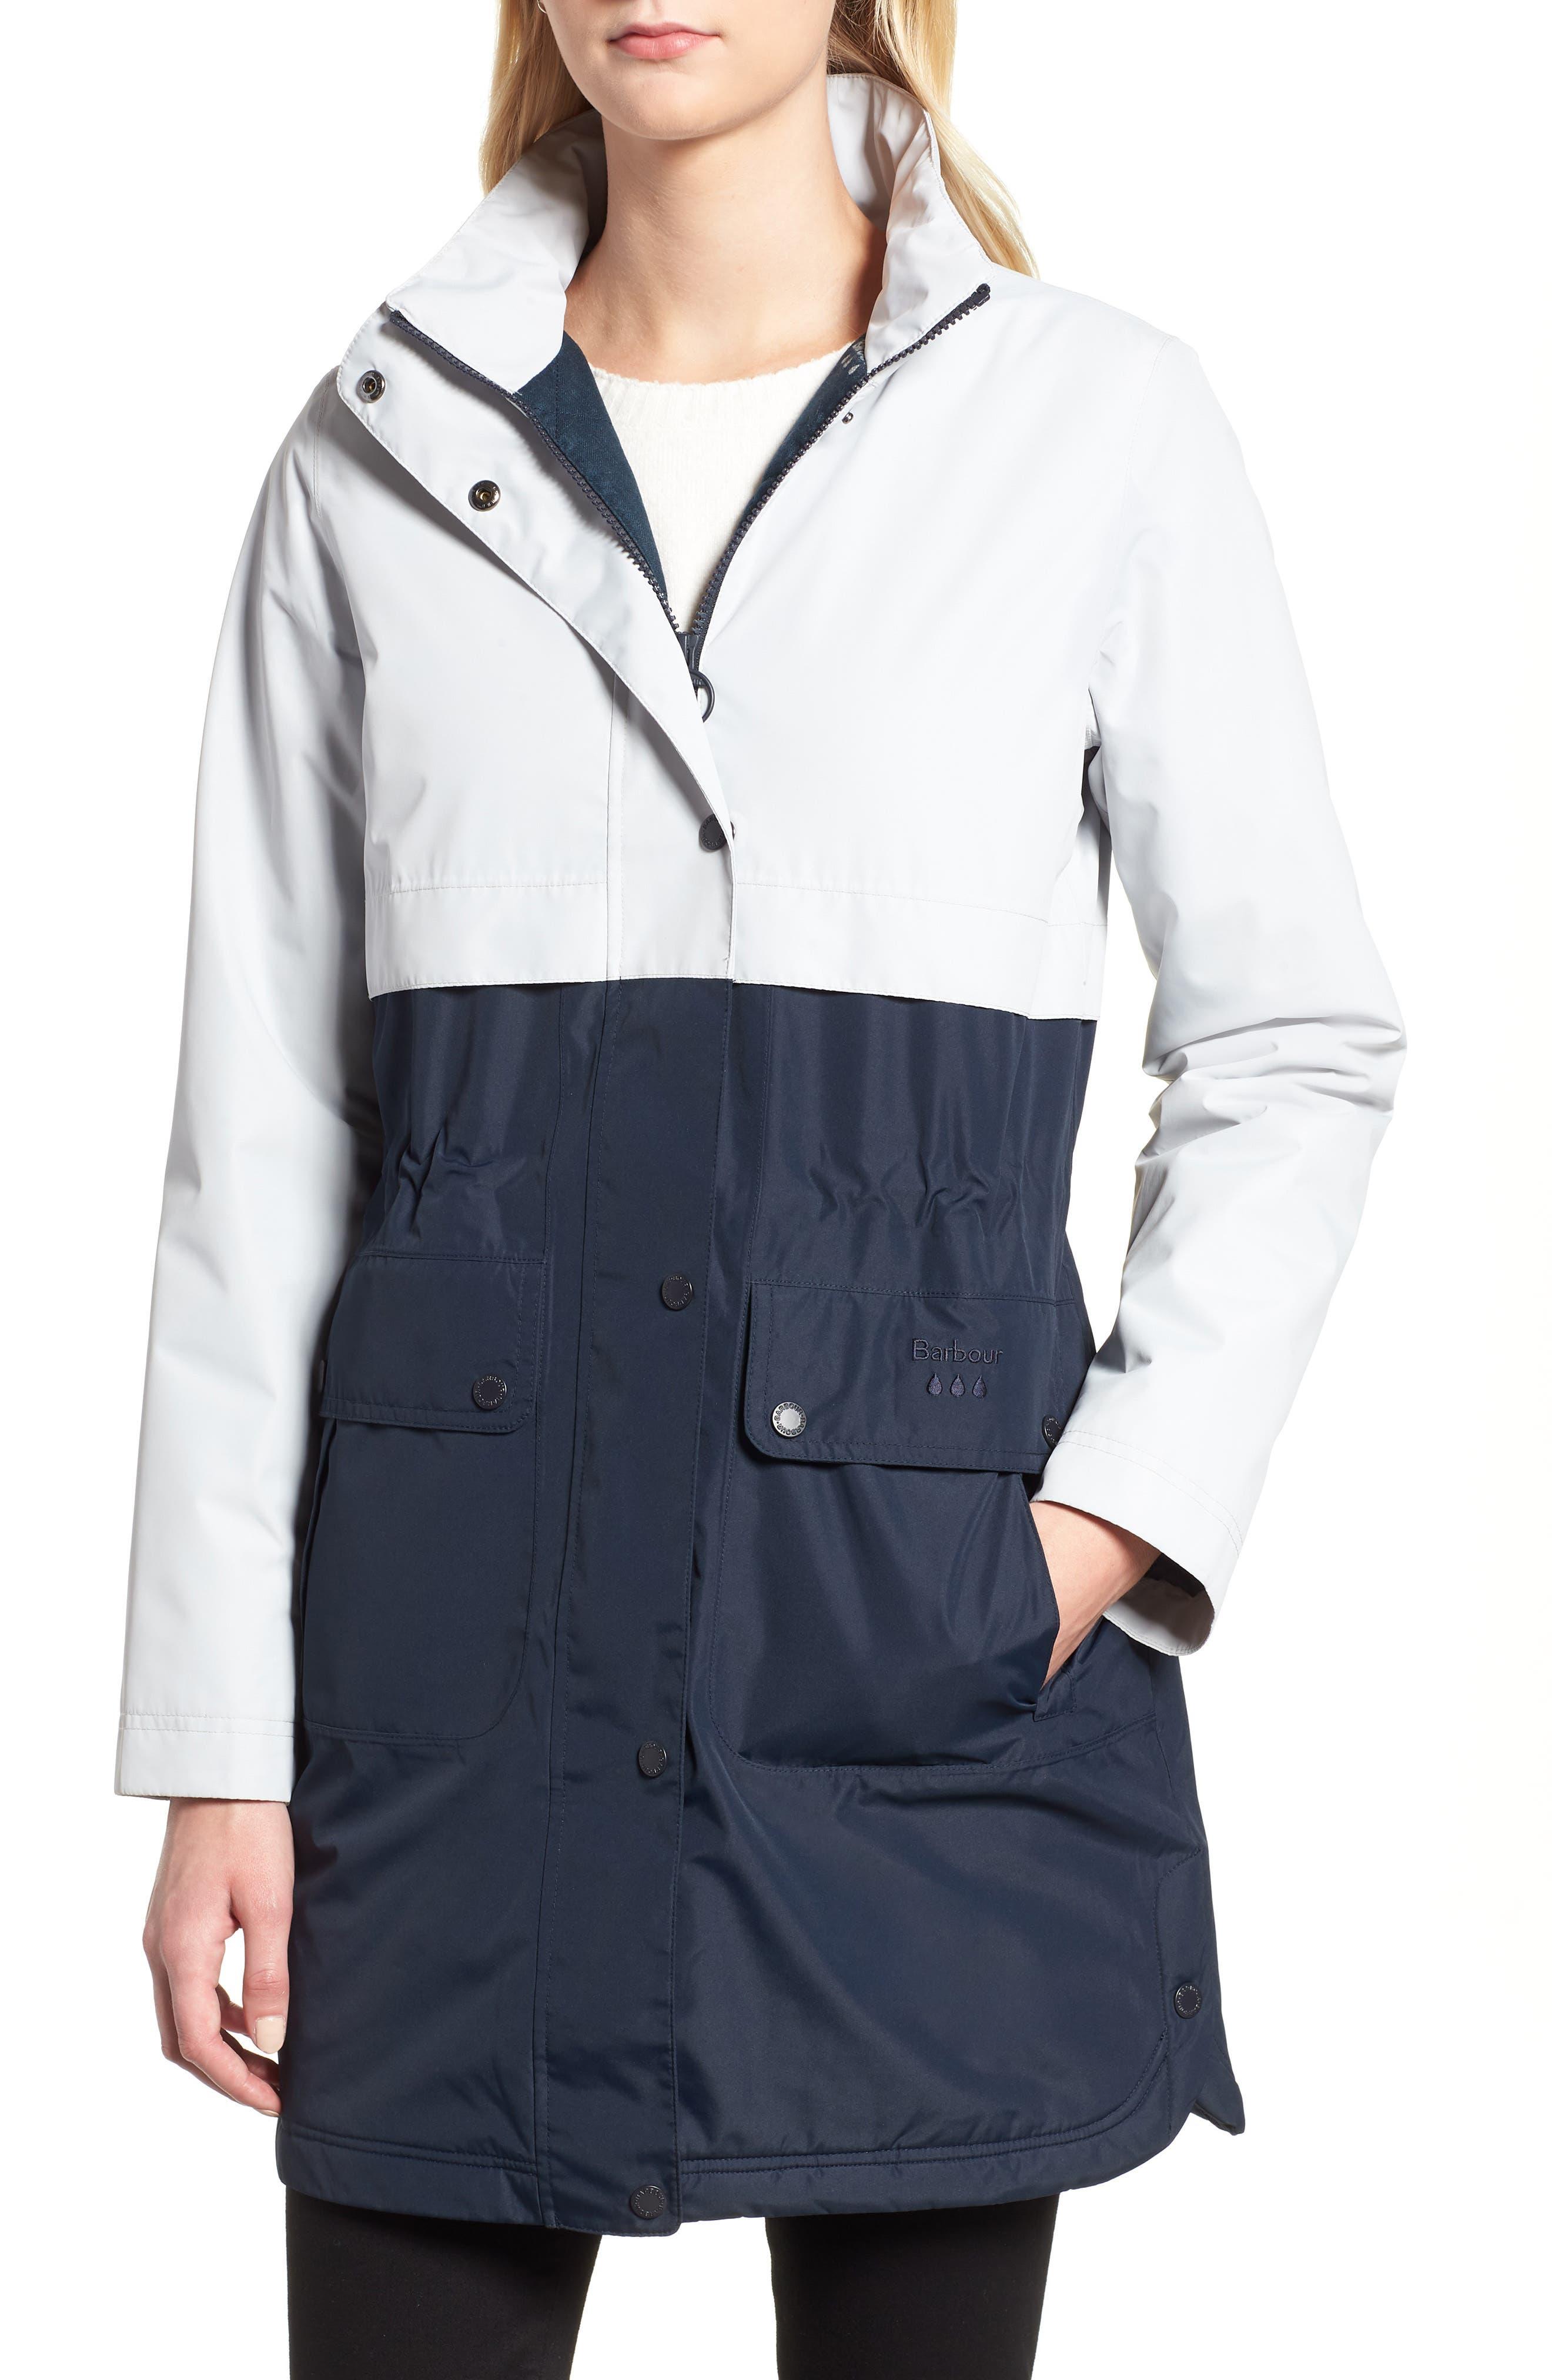 Damini Waterproof Jacket,                             Alternate thumbnail 4, color,                             410